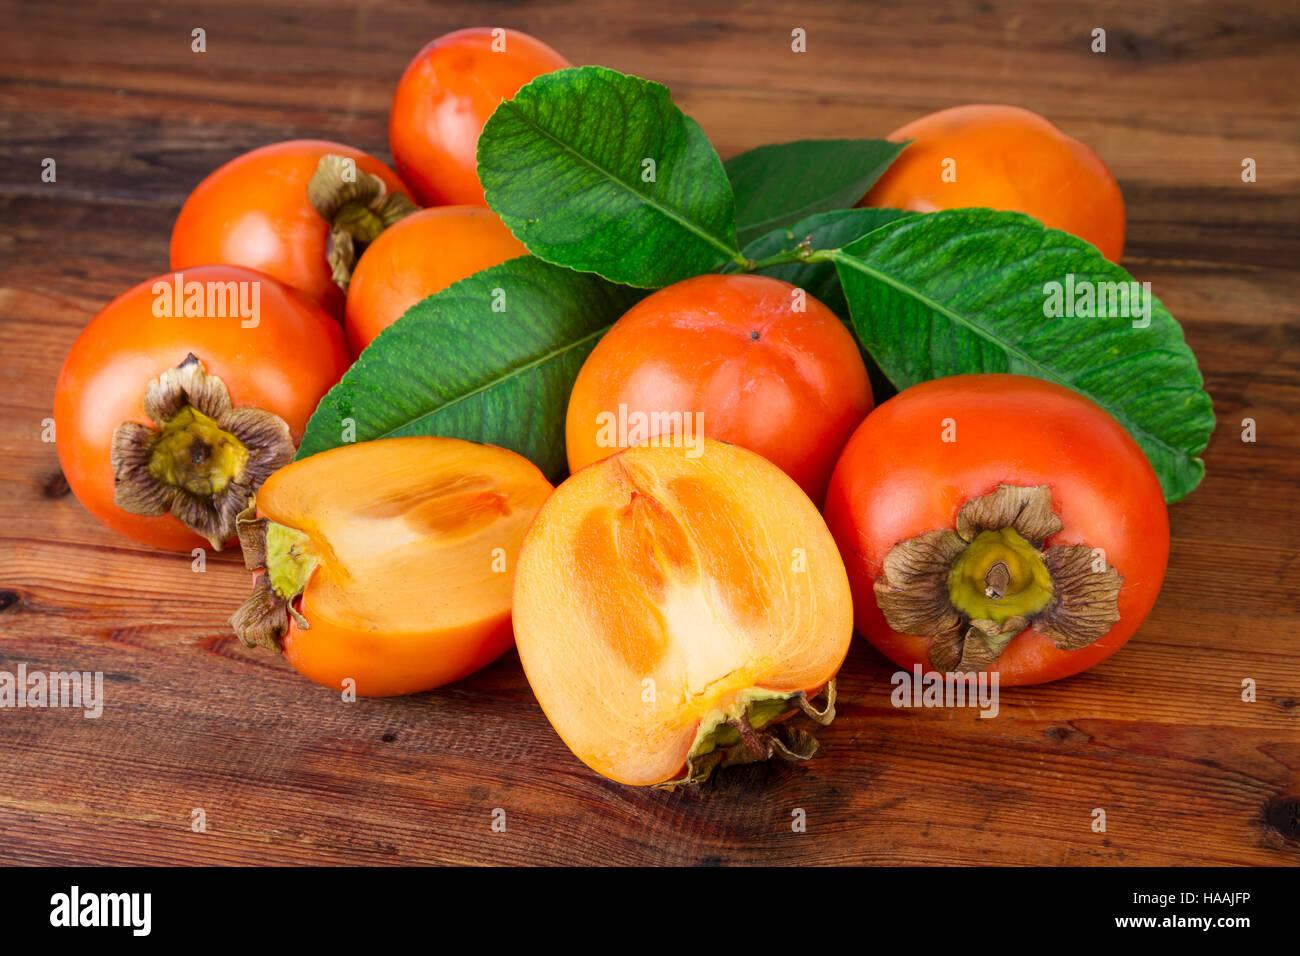 ripe persimmons kaki fruits on rustic background - Stock Image